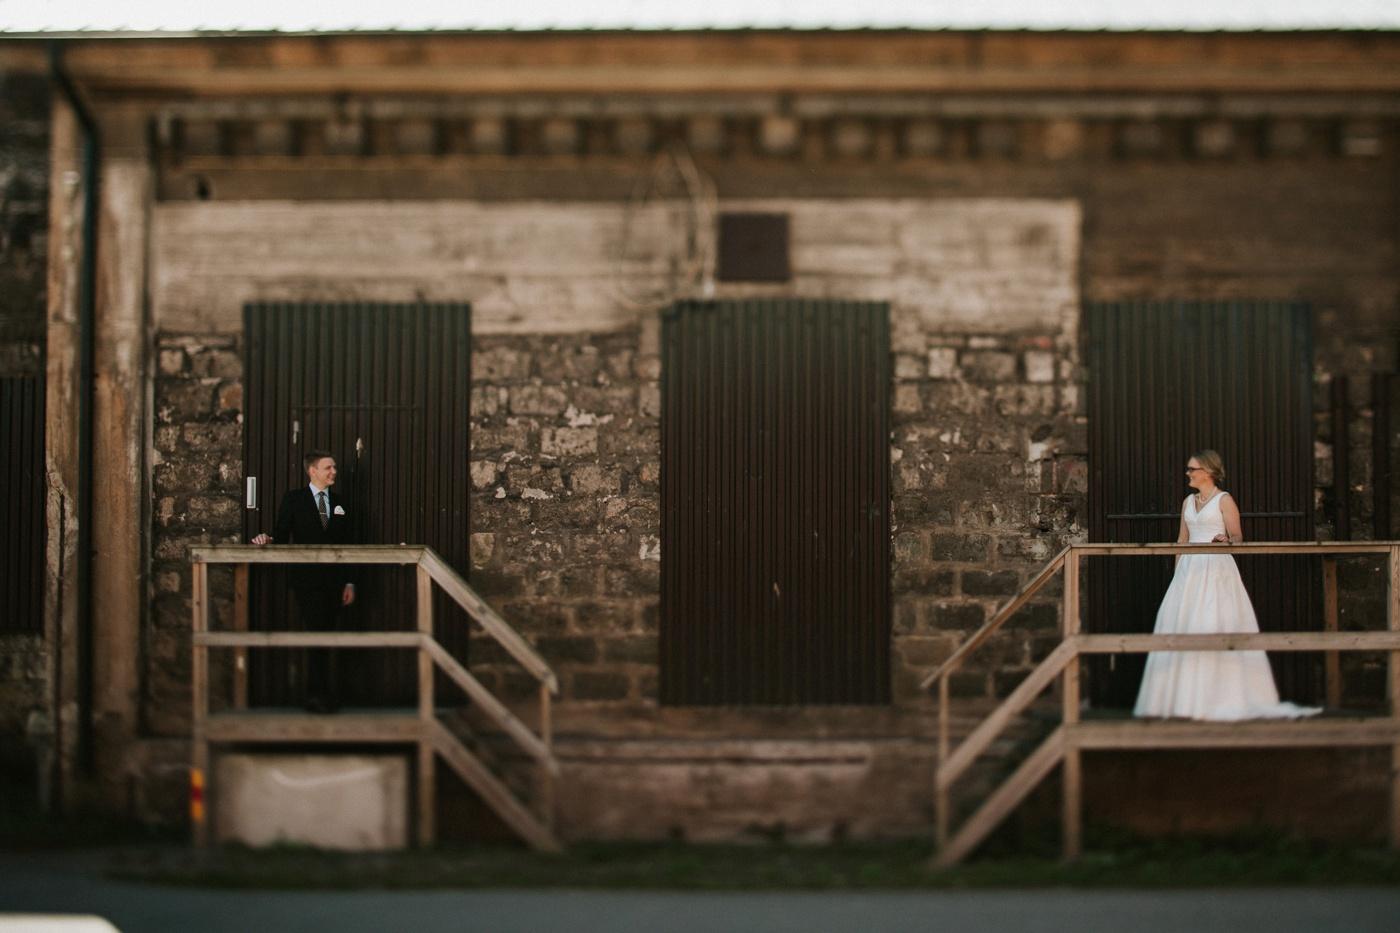 ceciliajoakim_sweden-countryside-summer-wedding_melbourne-fun-quirky-wedding-photography_36